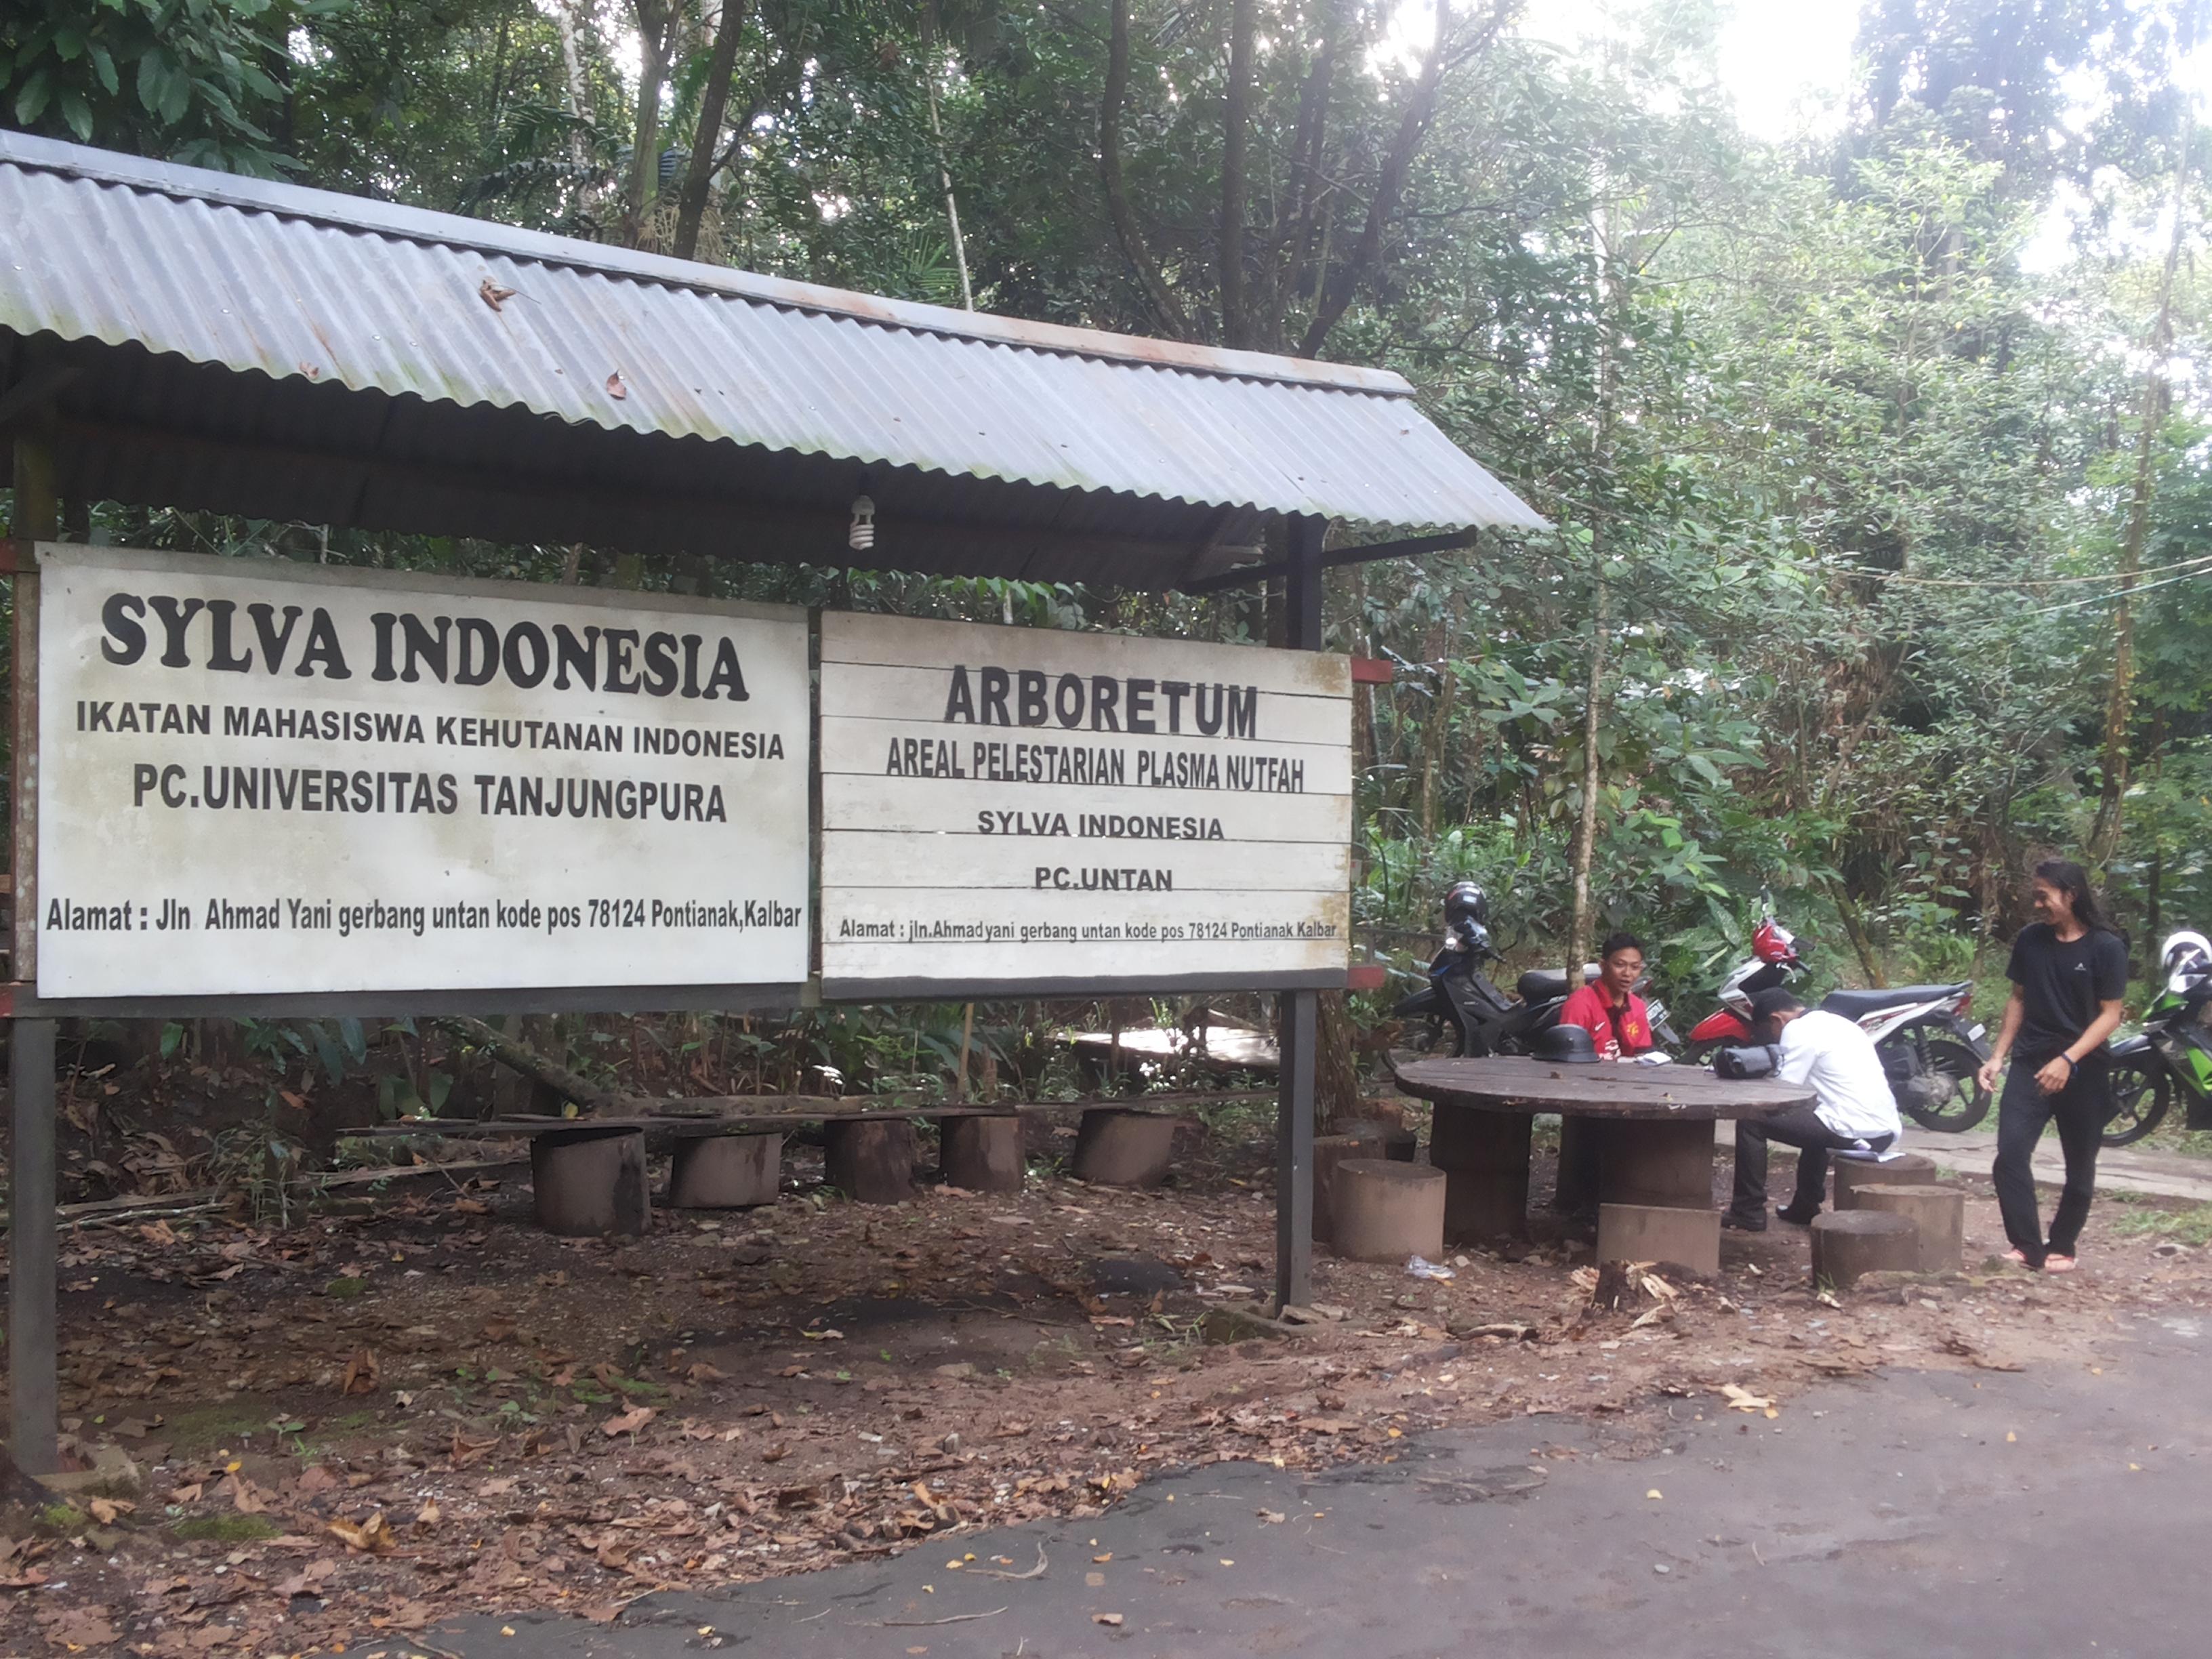 Arboretum Sylva Untan Internasional Thetanjungpuratimes Dorong Dikenal Dunia Hutan Kota